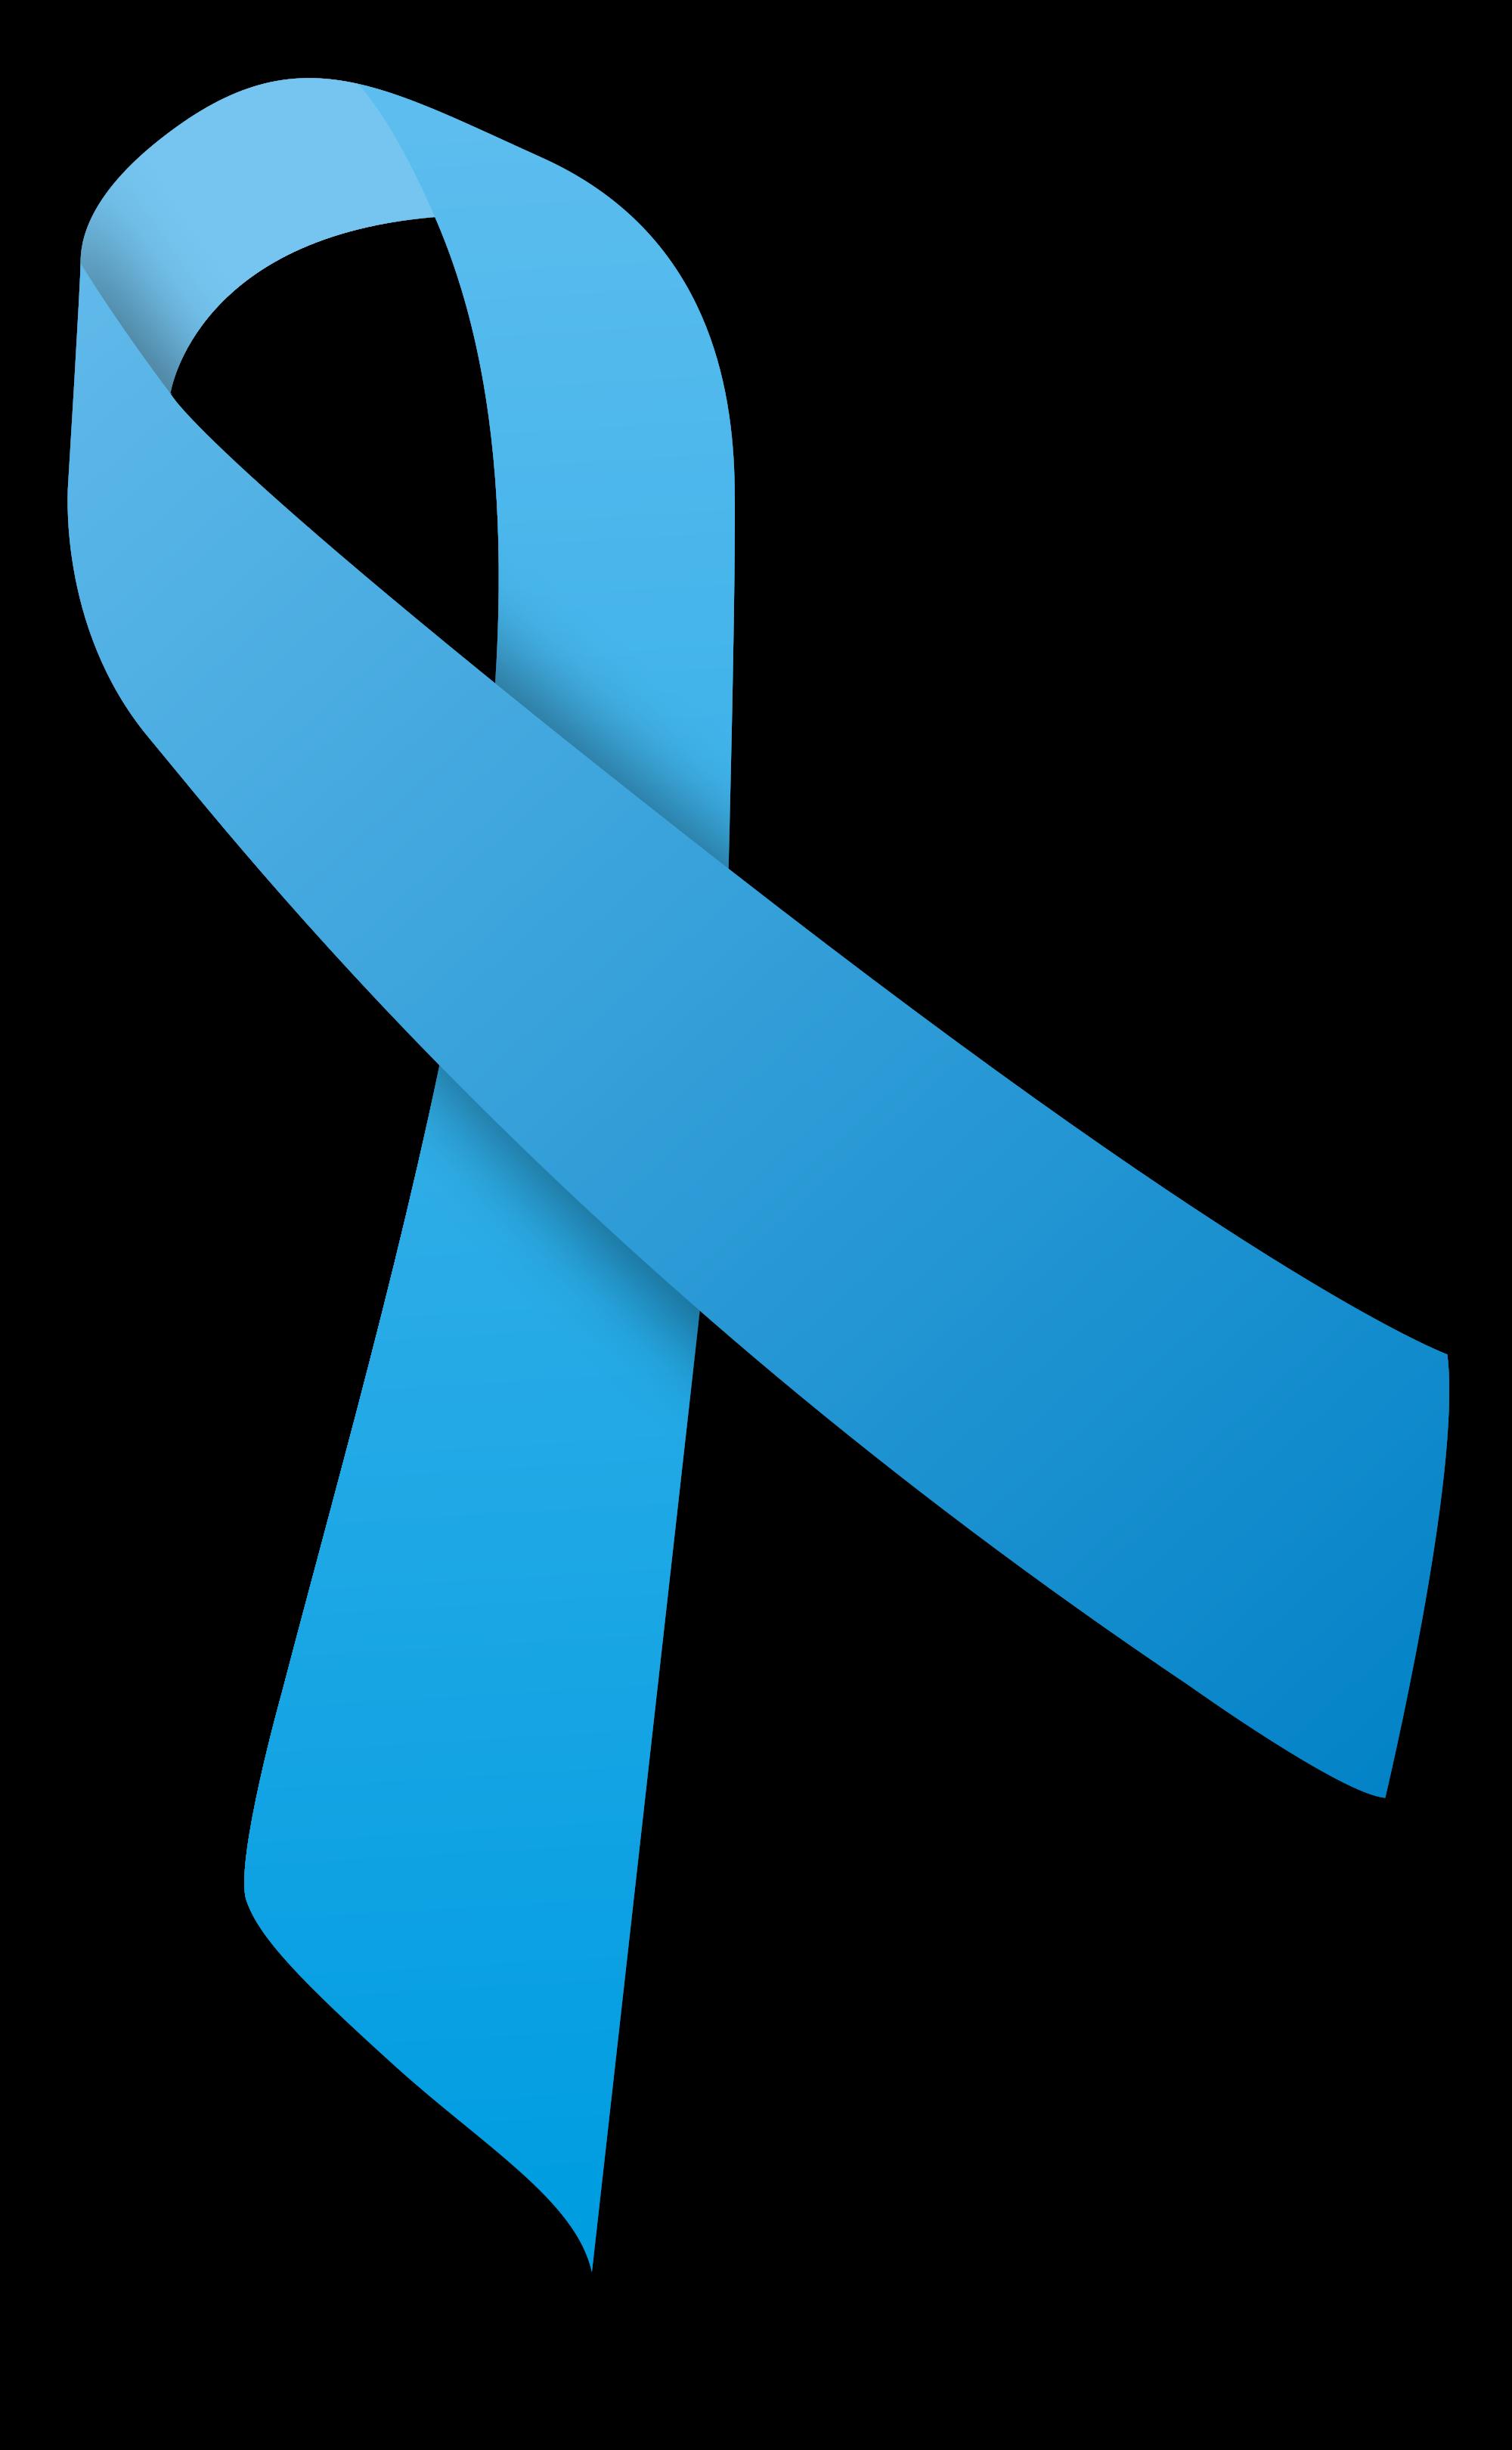 File:Light blue ribbon.svg - Wikimedia Commons